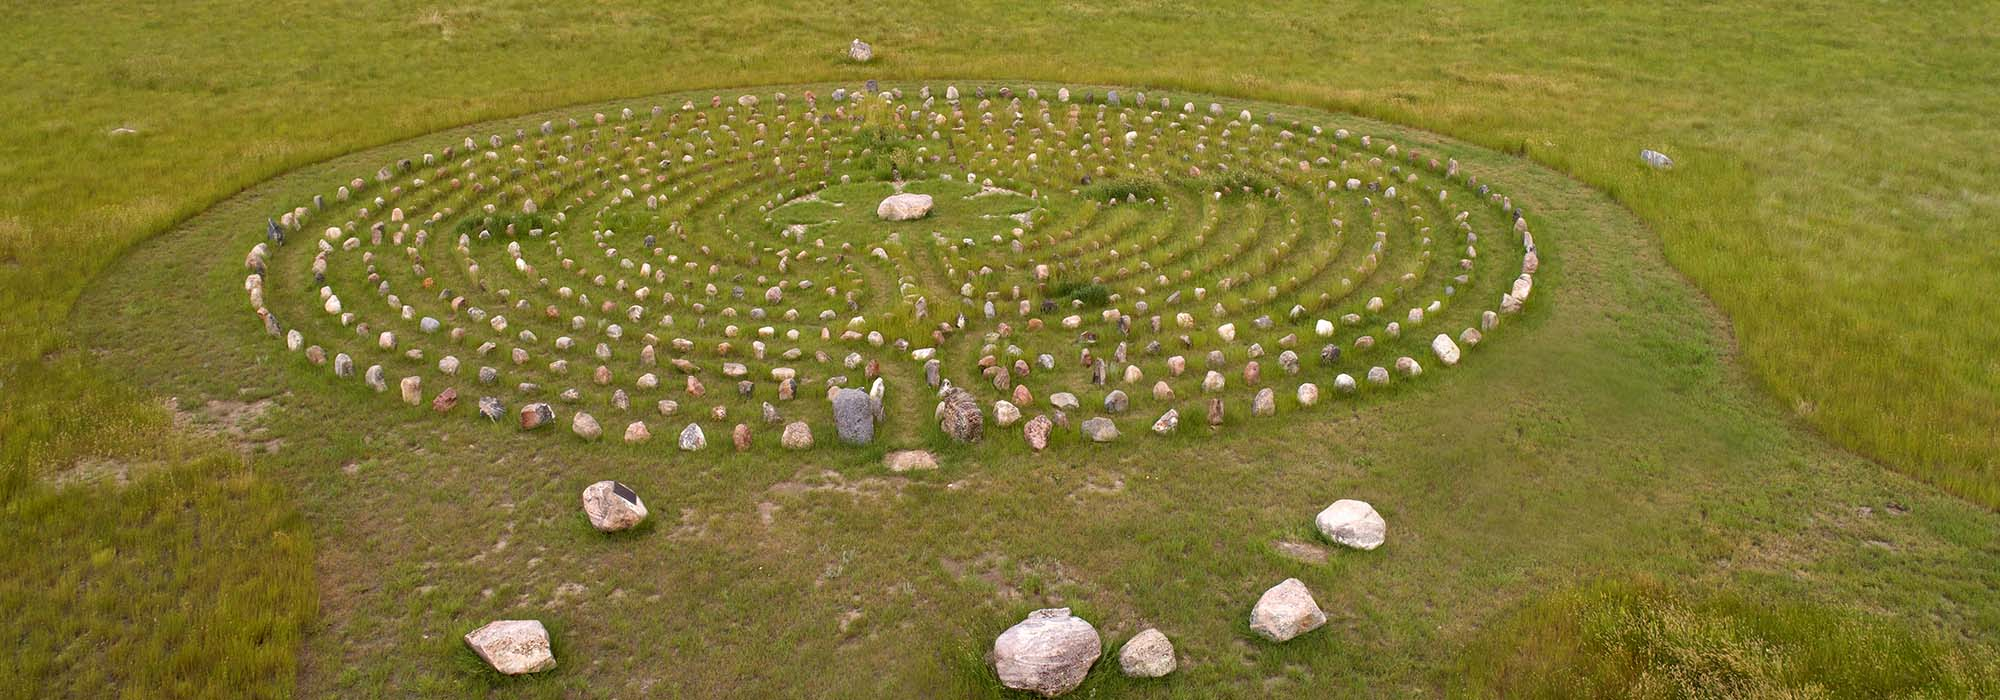 Aerial, Mary's Labyrinth, south of Val Marie, Saskatchewan